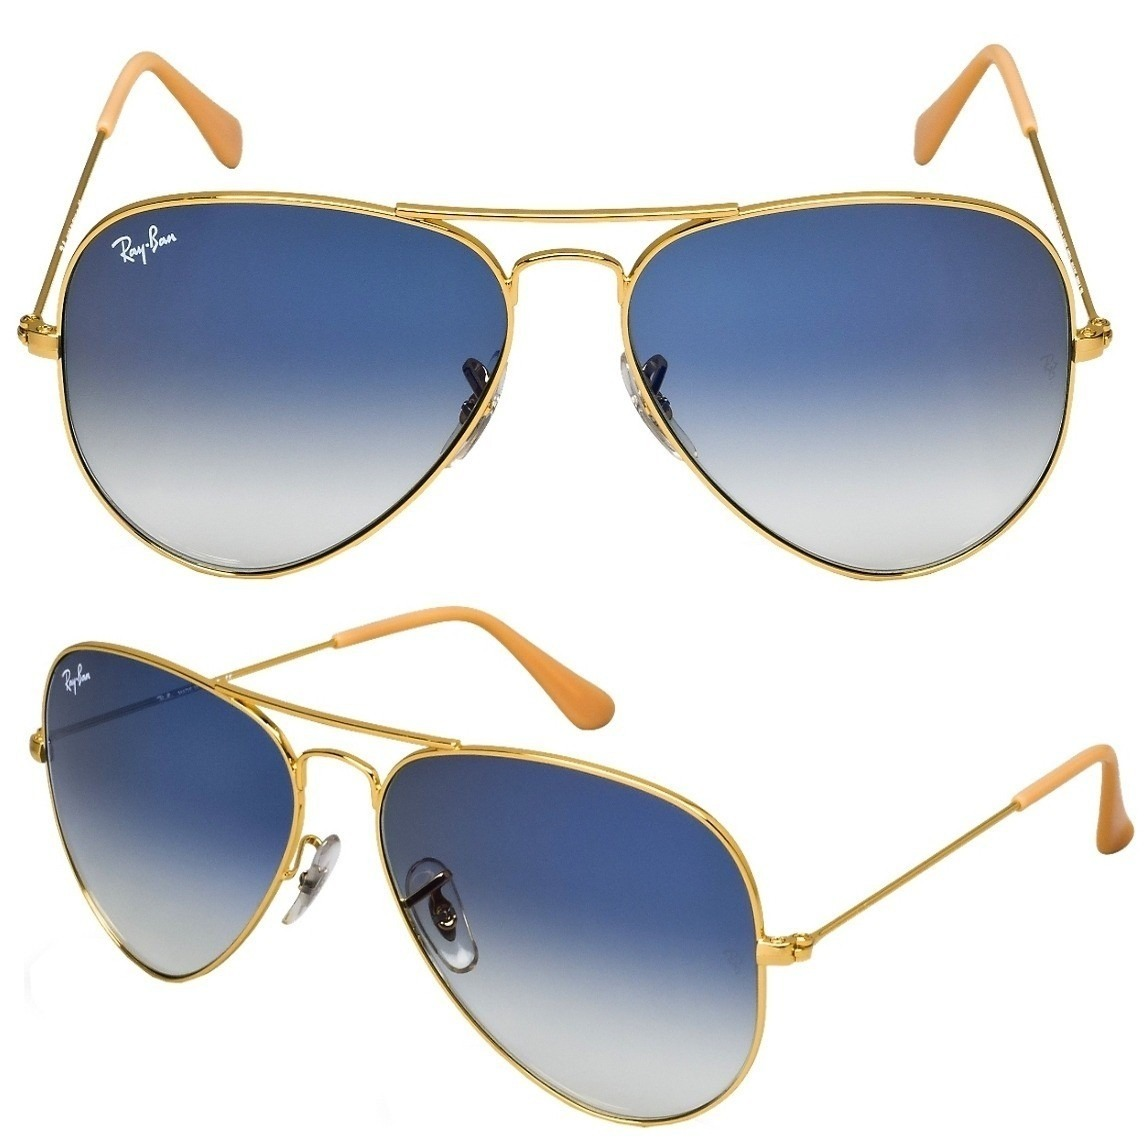 85f61fa2d5061 oculos ray ban original masculino mercadolivre oculos ray ban original  masculino mercadolivre ...